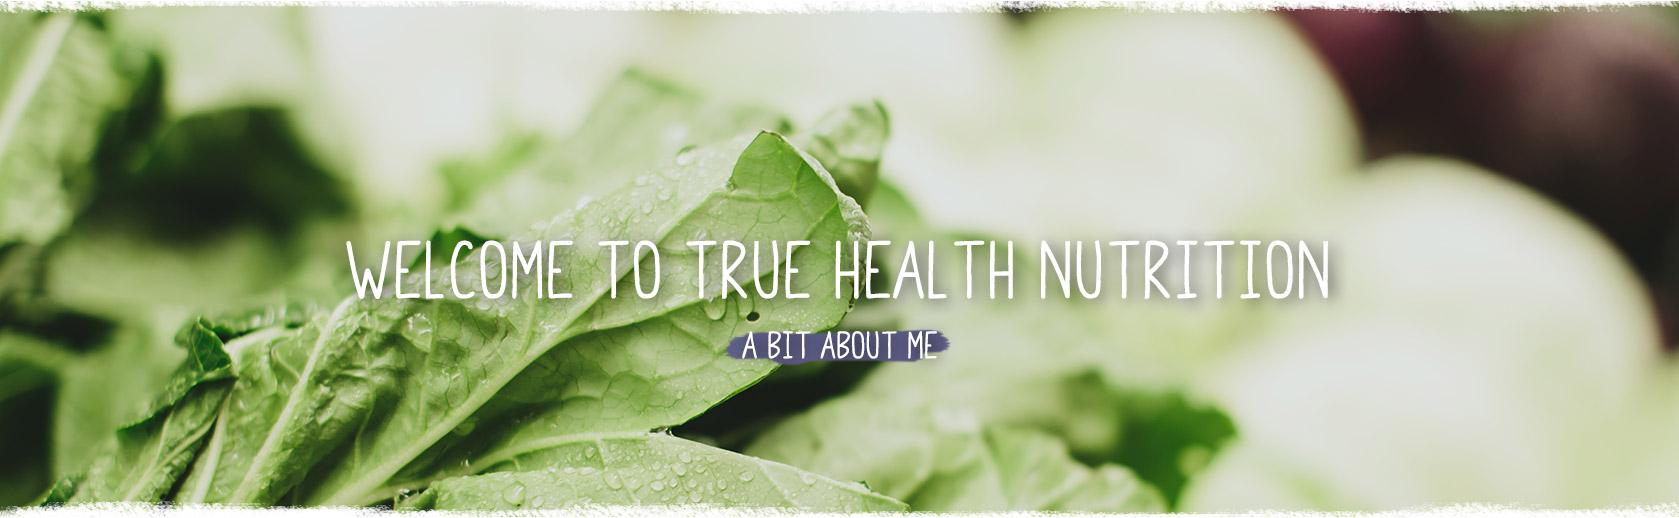 True Health Nutrition